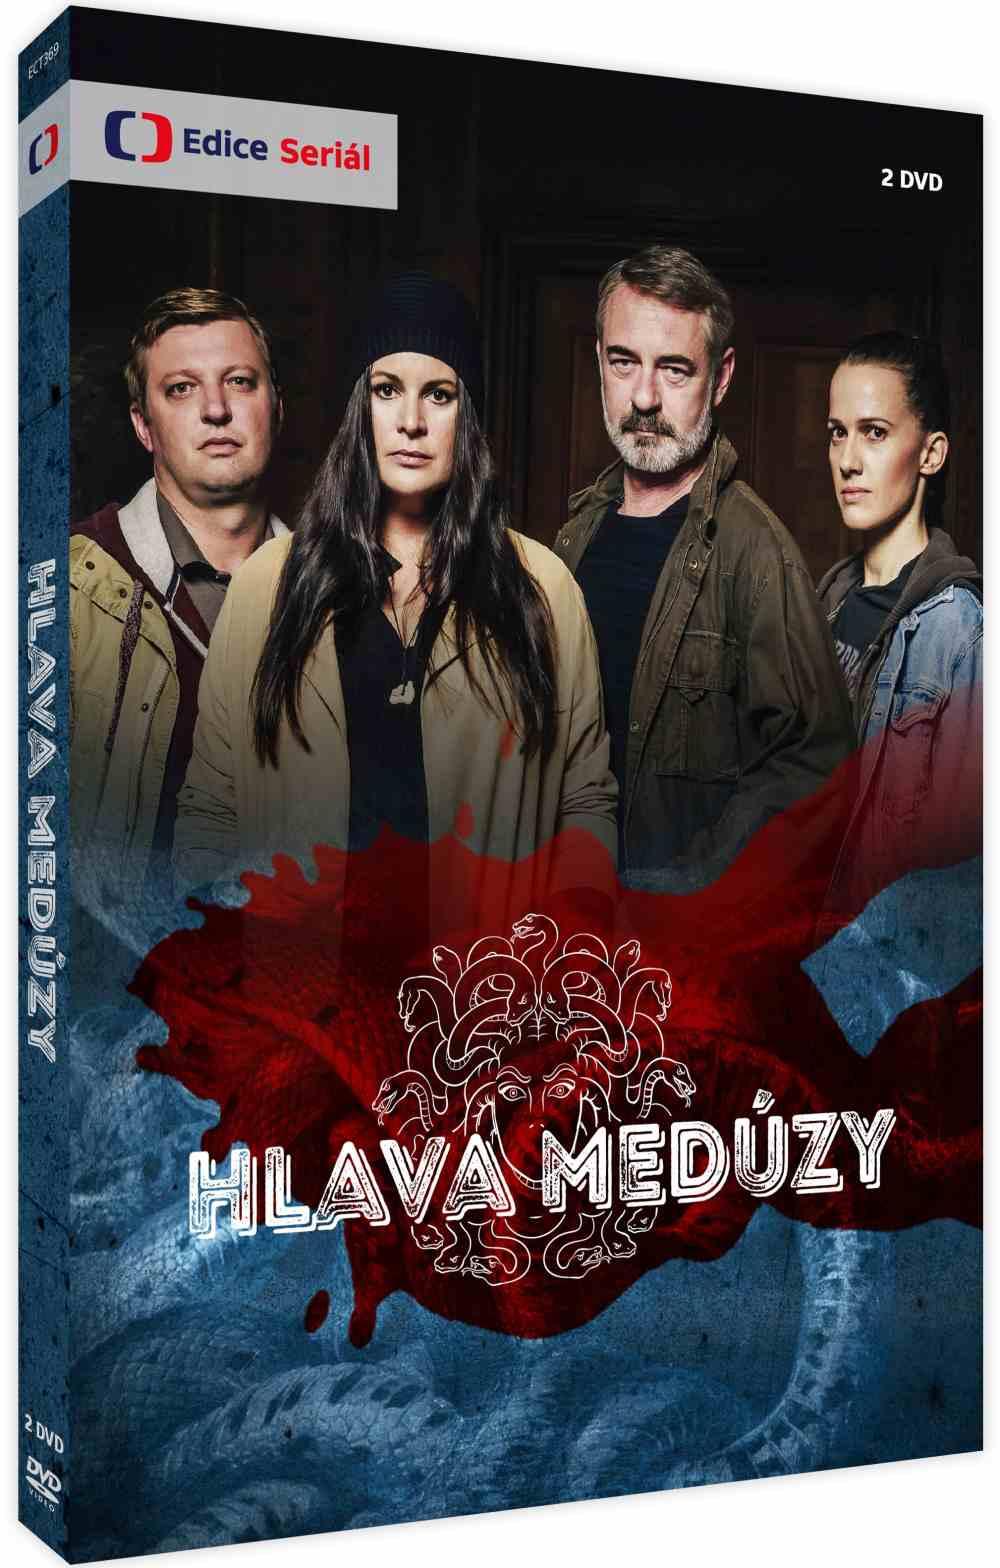 Hlava medúzy - 2 DVD